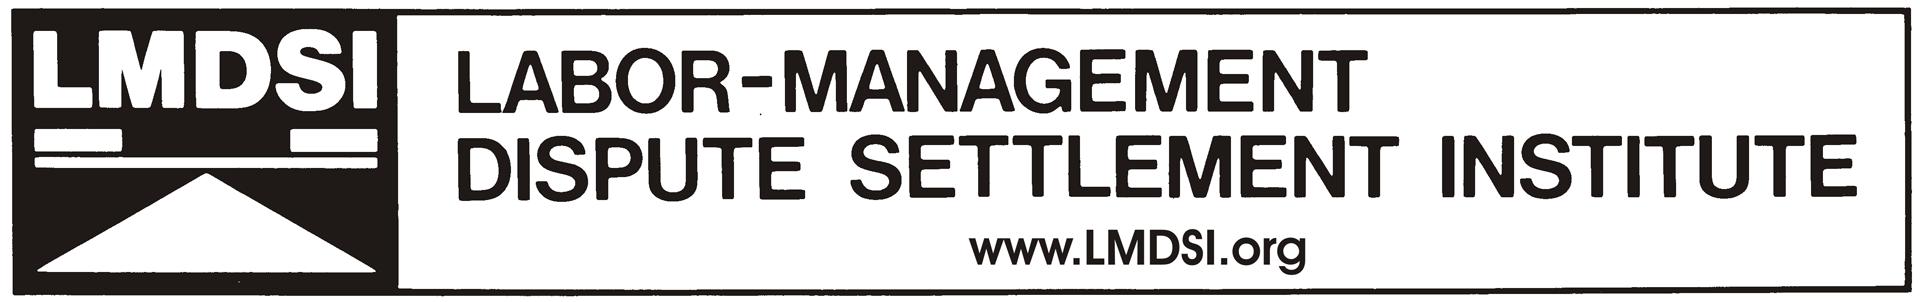 LMDSI.org Logo